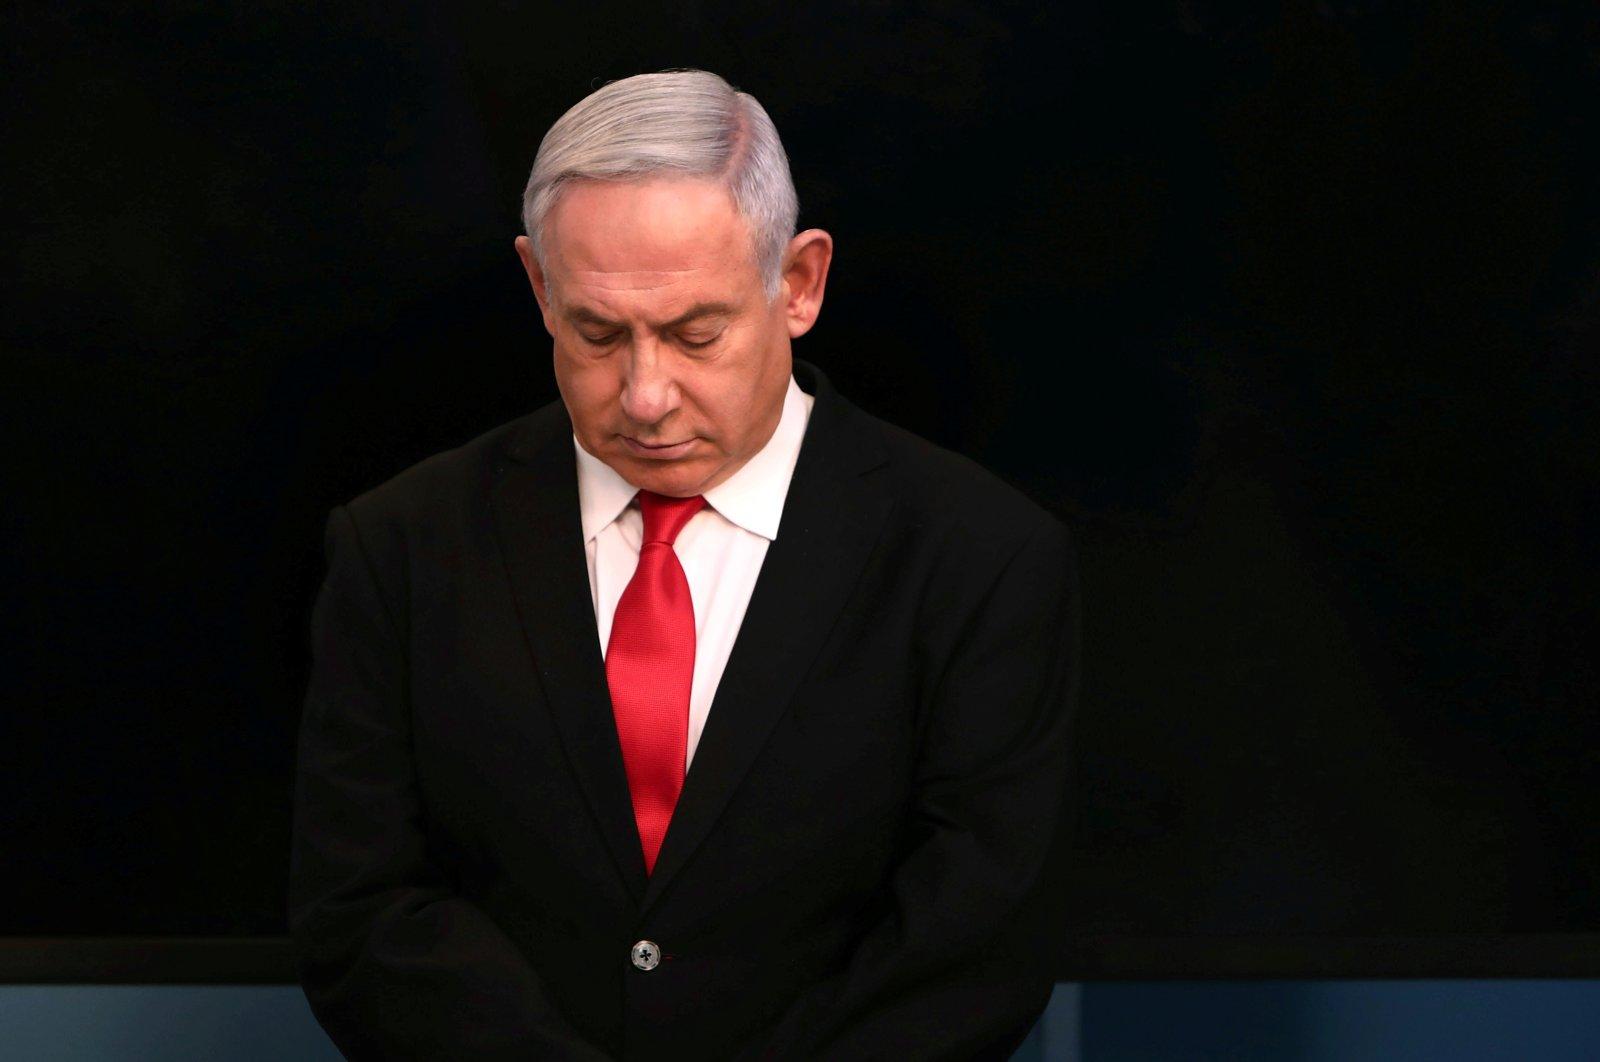 Israeli Prime Minister Benjamin Netanyahu arrives for a speech at his Jerusalem office, Israel, March 14, 2020. (Reuters Photo)